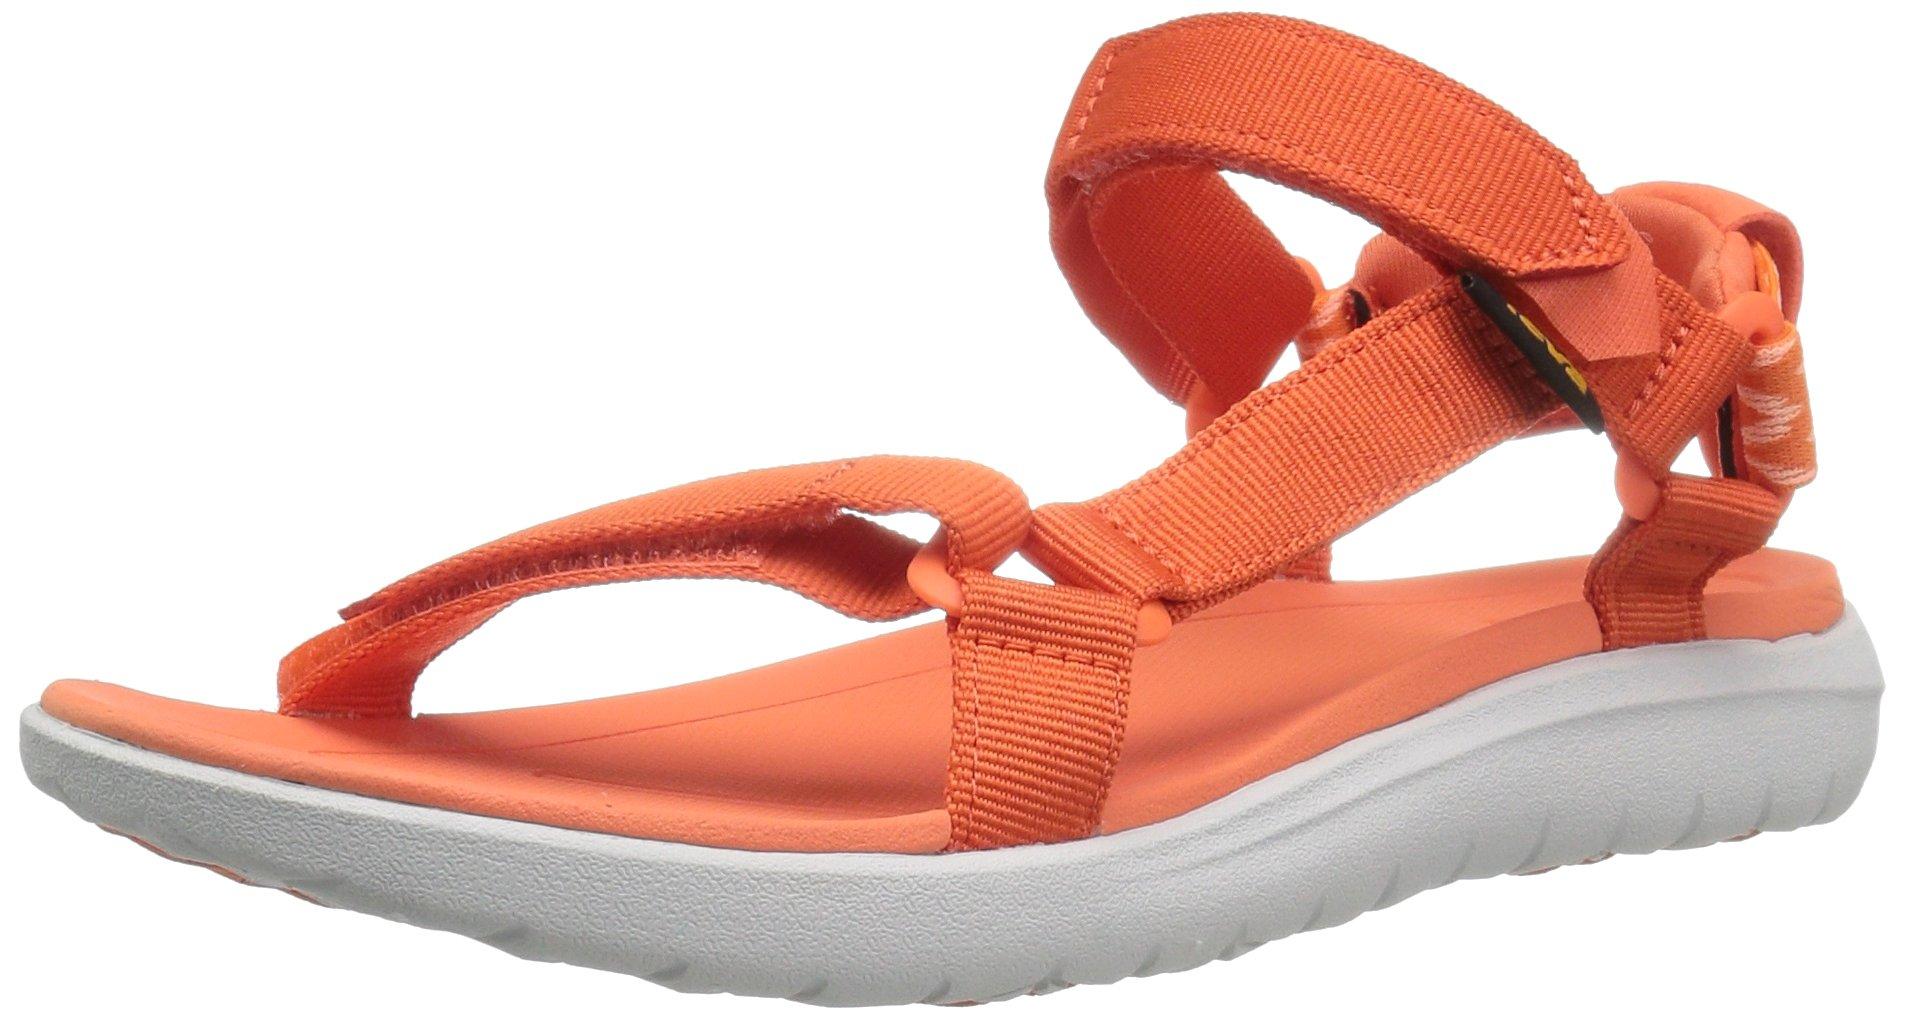 Teva Women's W Sanborn Universal Sandal, Tiger Lily, 8 M US